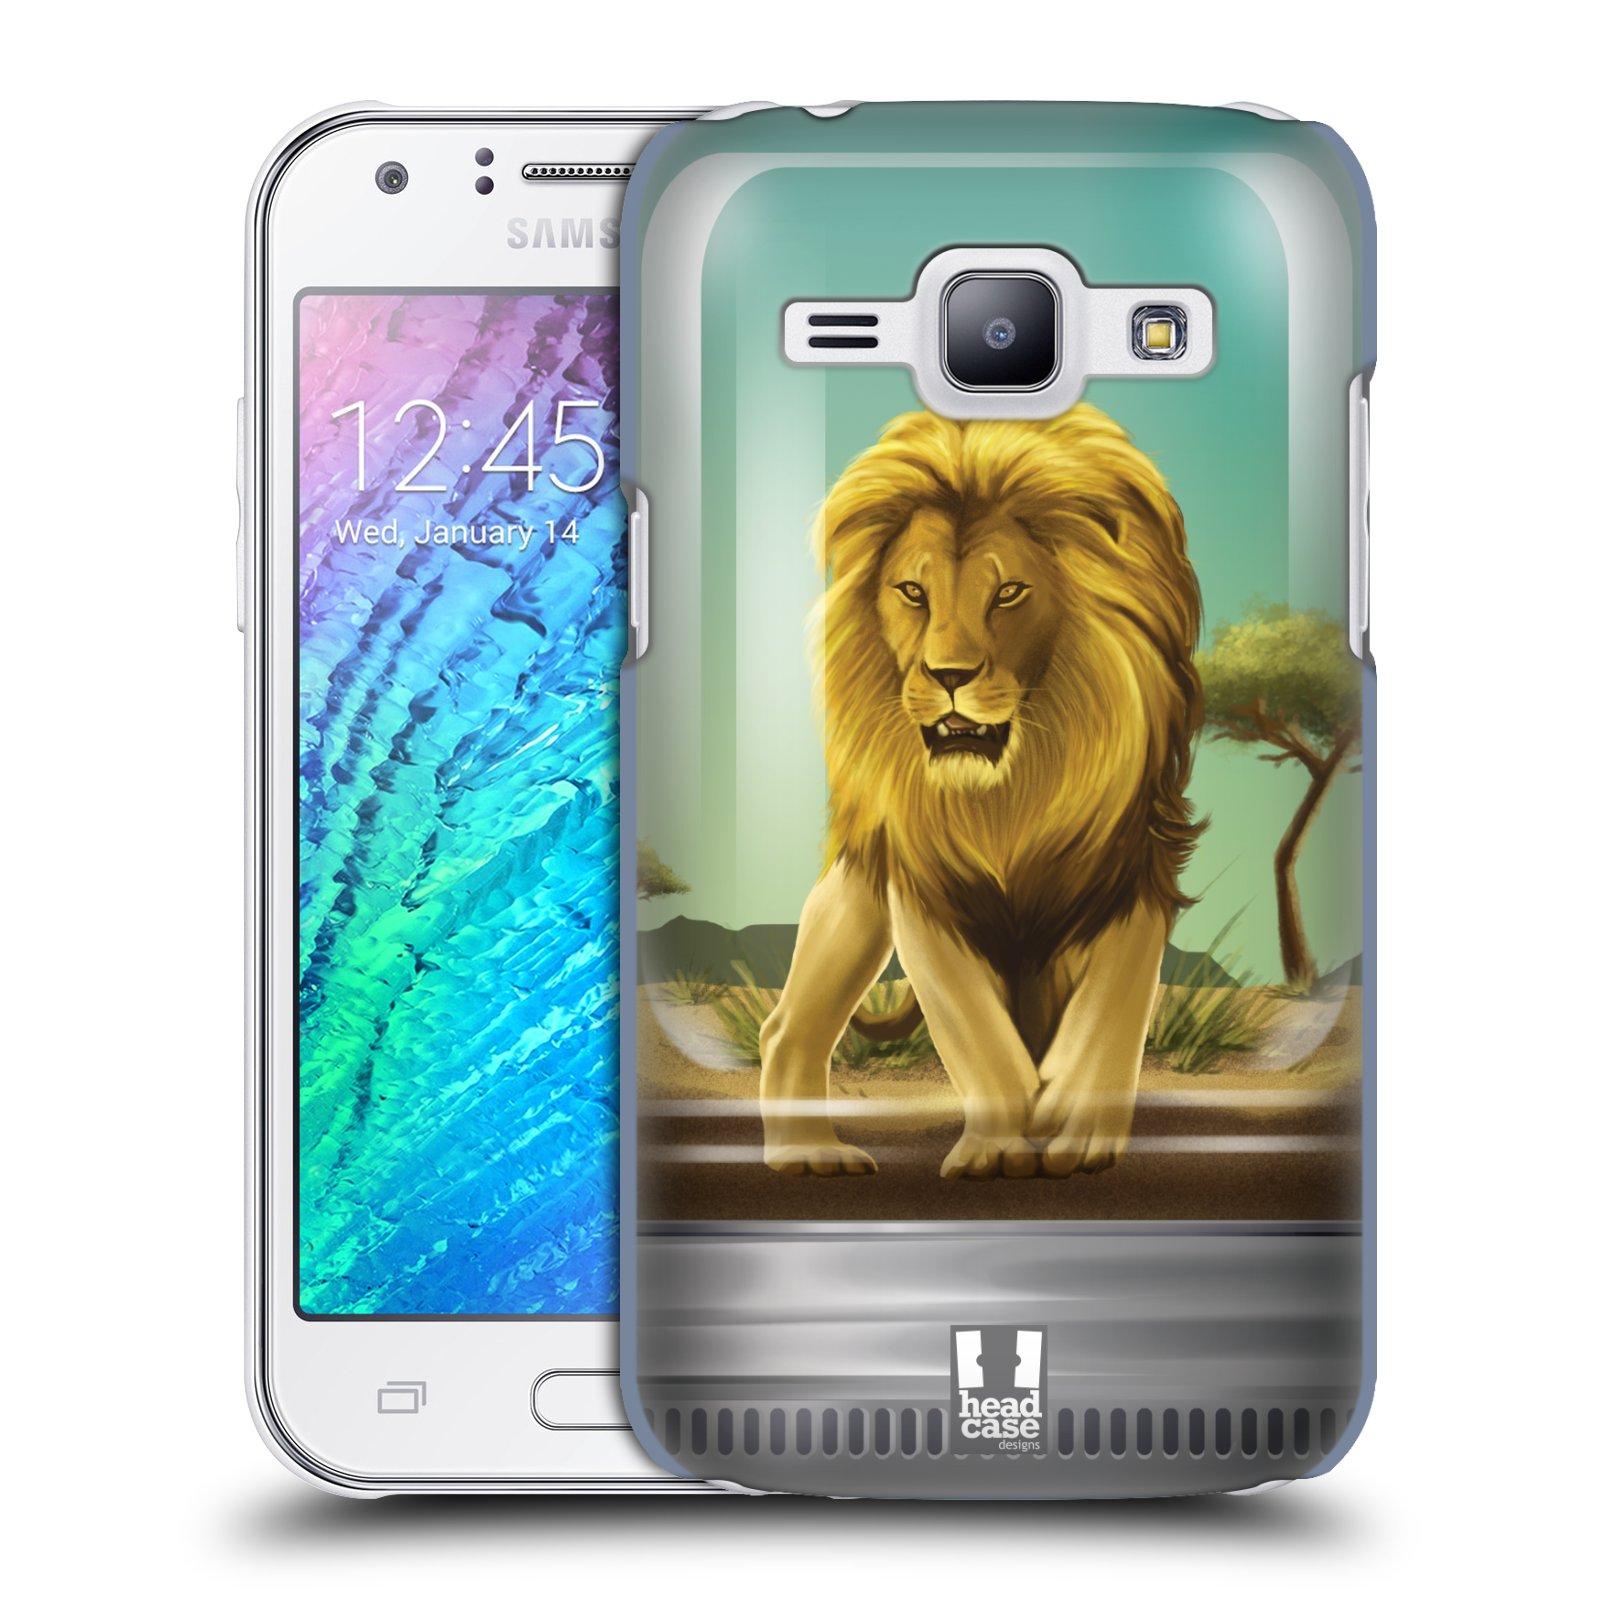 HEAD CASE plastový obal na mobil SAMSUNG Galaxy J1, J100 vzor Zvířátka v těžítku lev